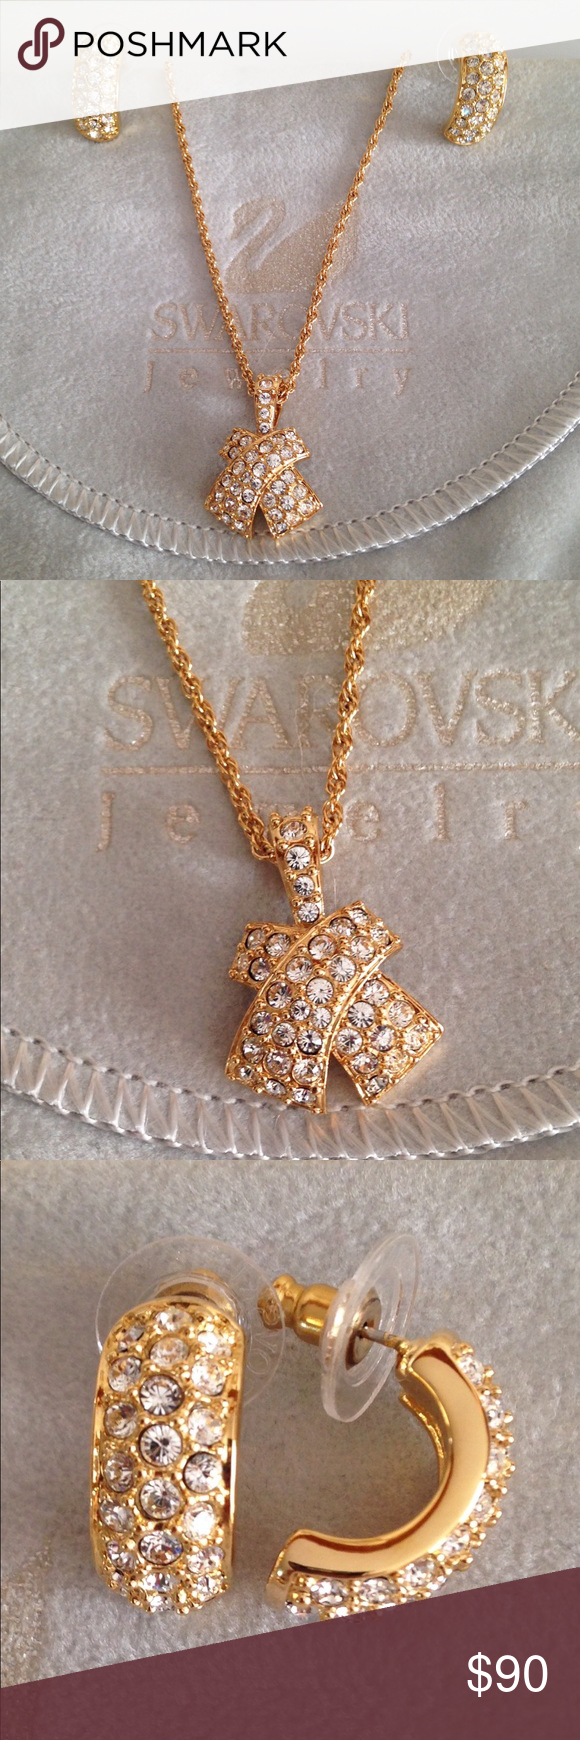 Hpxgold swarovski necklace u earrings set in my posh